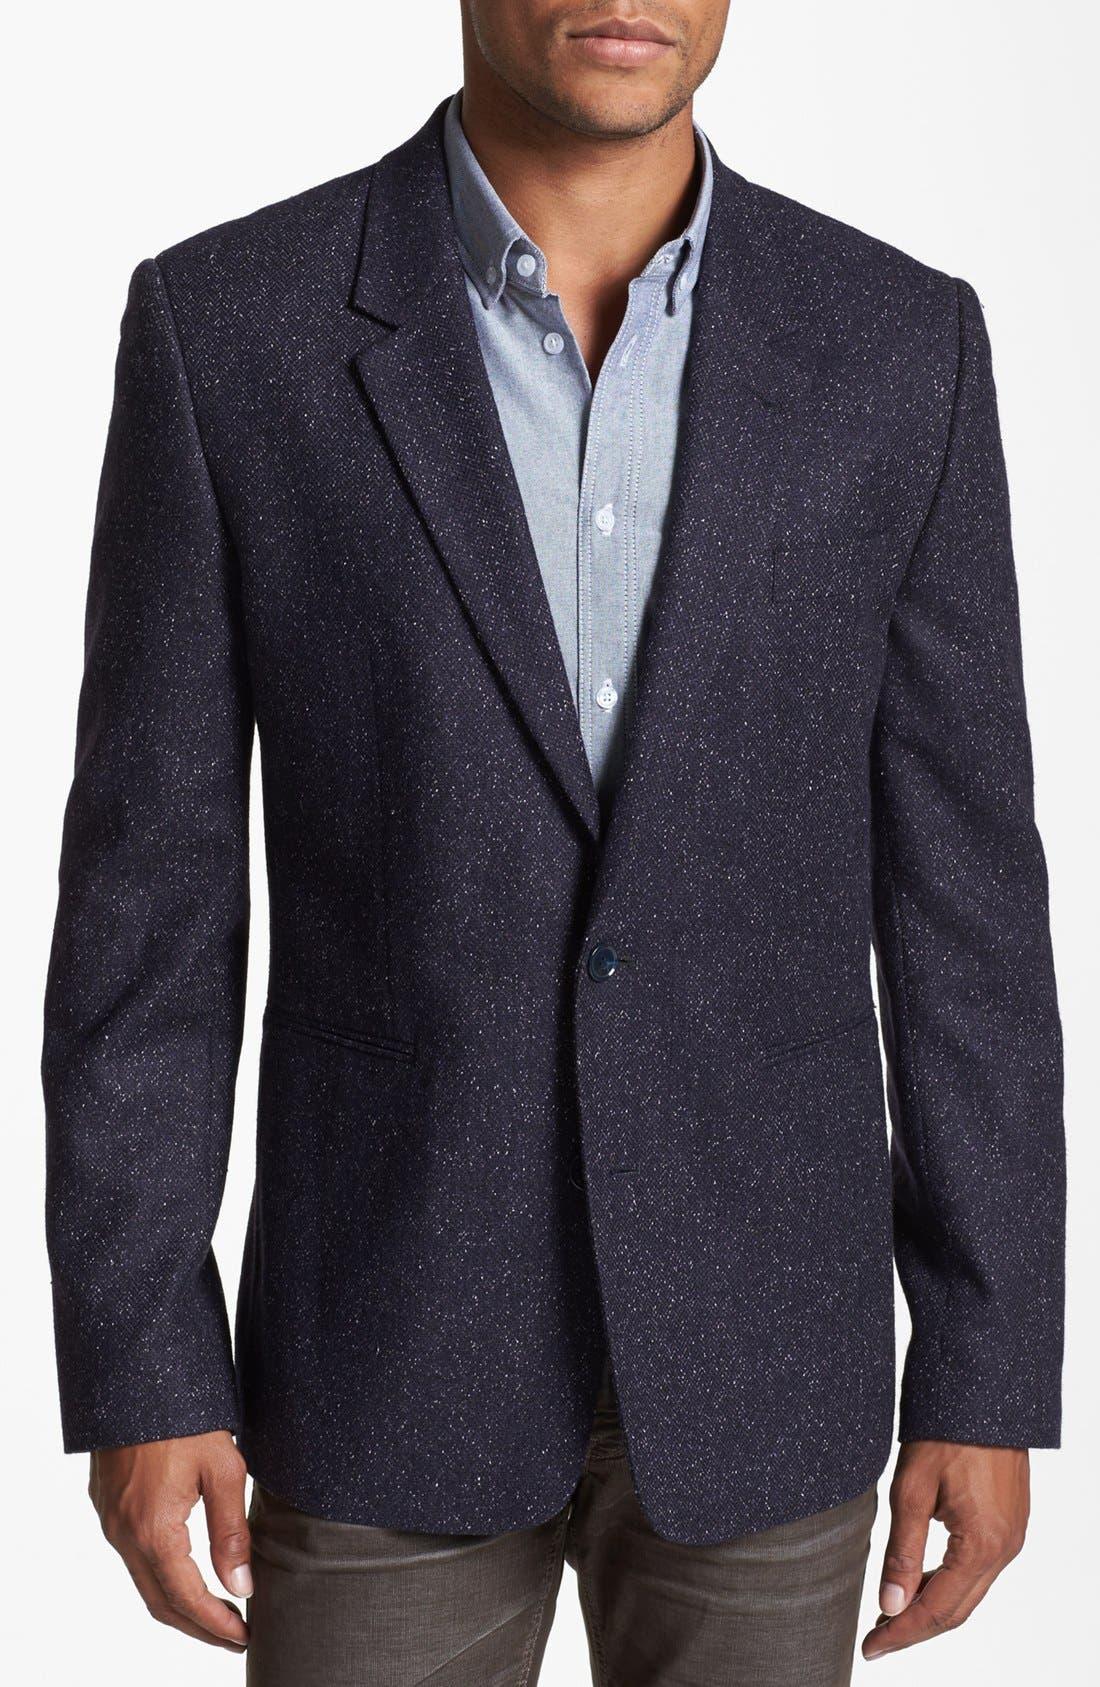 Main Image - Slate & Stone Tweed Blazer